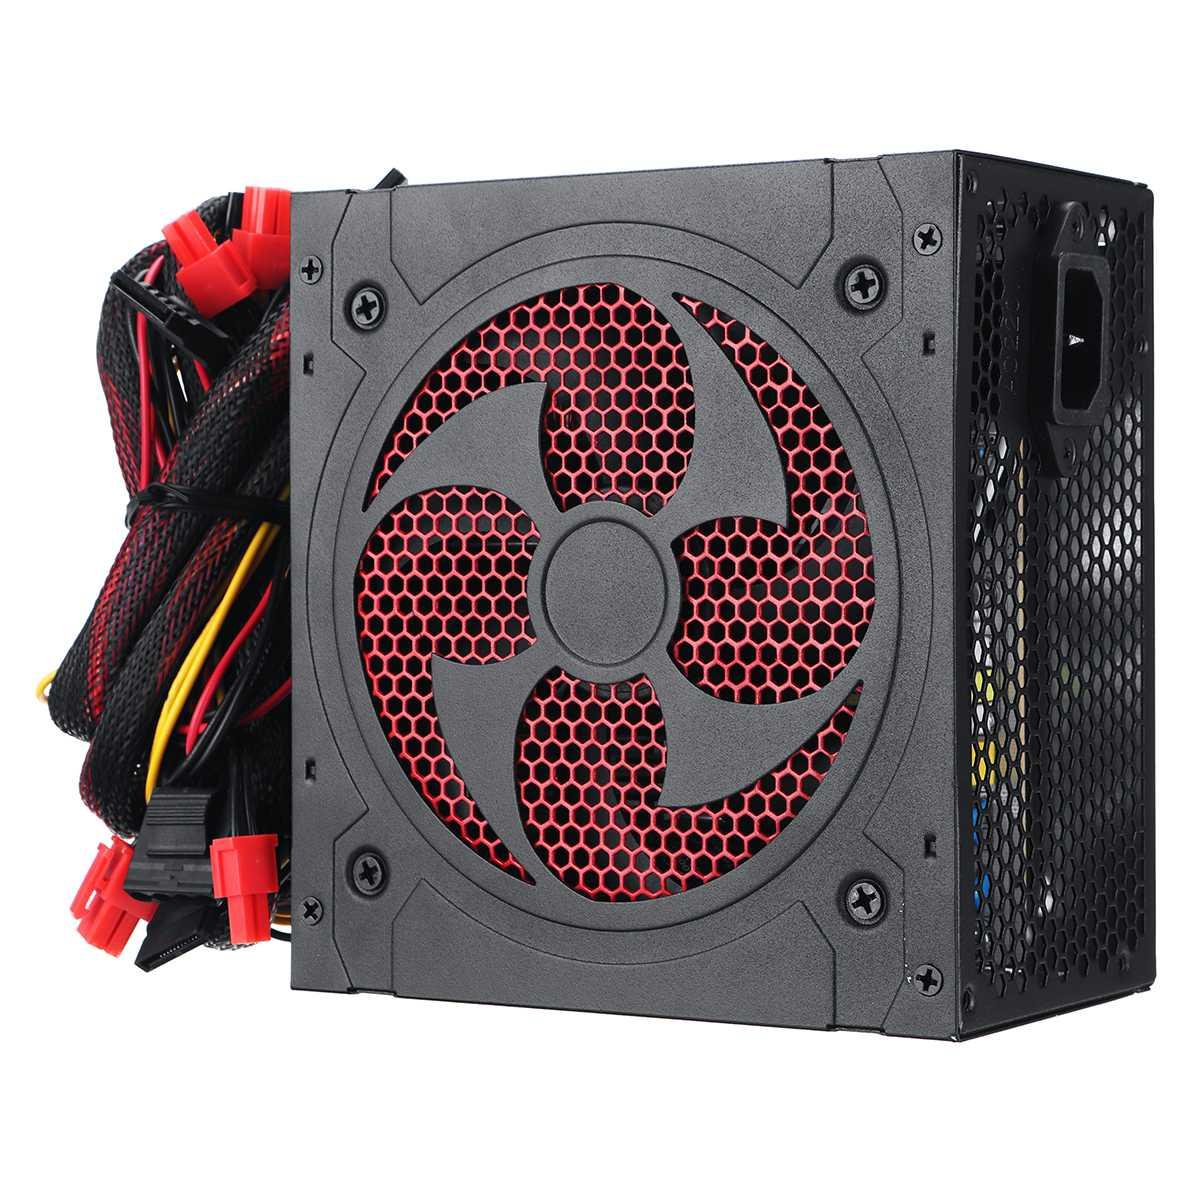 Black 1000W Power Supply PFC Silent Fan ATX 20pin 12V PC Computer SATA Gaming PC Power Supply For Intel AMD Computer